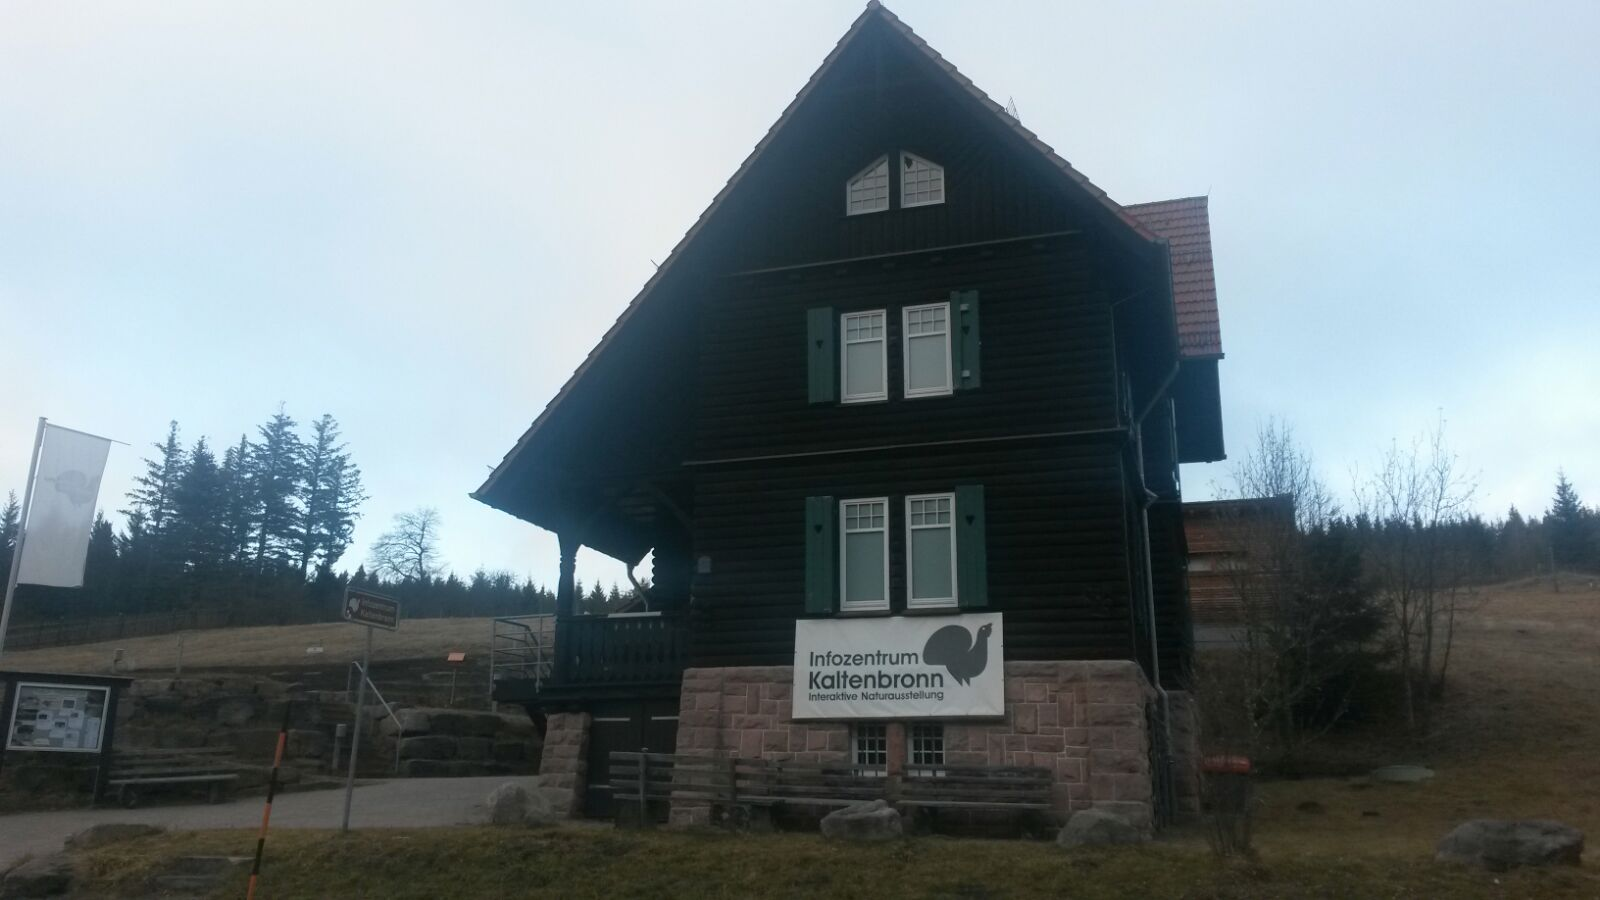 Kaltenbronn Infozentrum Grünhütte